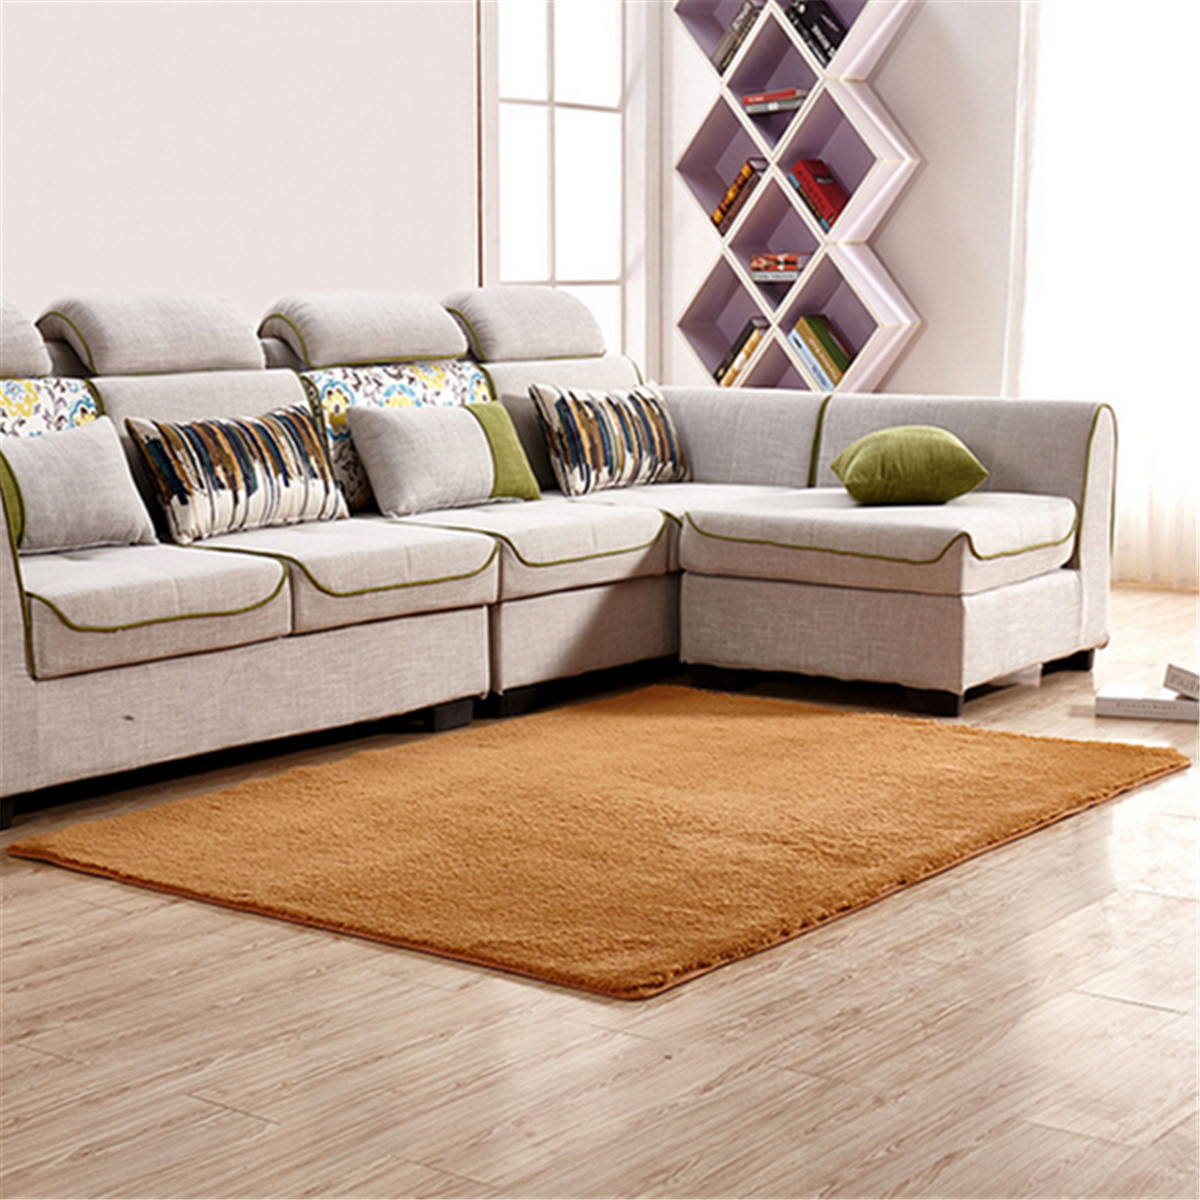 63x47 2 63x31 5 Inch Anti Skid Shaggy Fluffy Area Rug Bedroom Carpet Floor Warm Mat For Home Decor 160x120cm 160x80cm